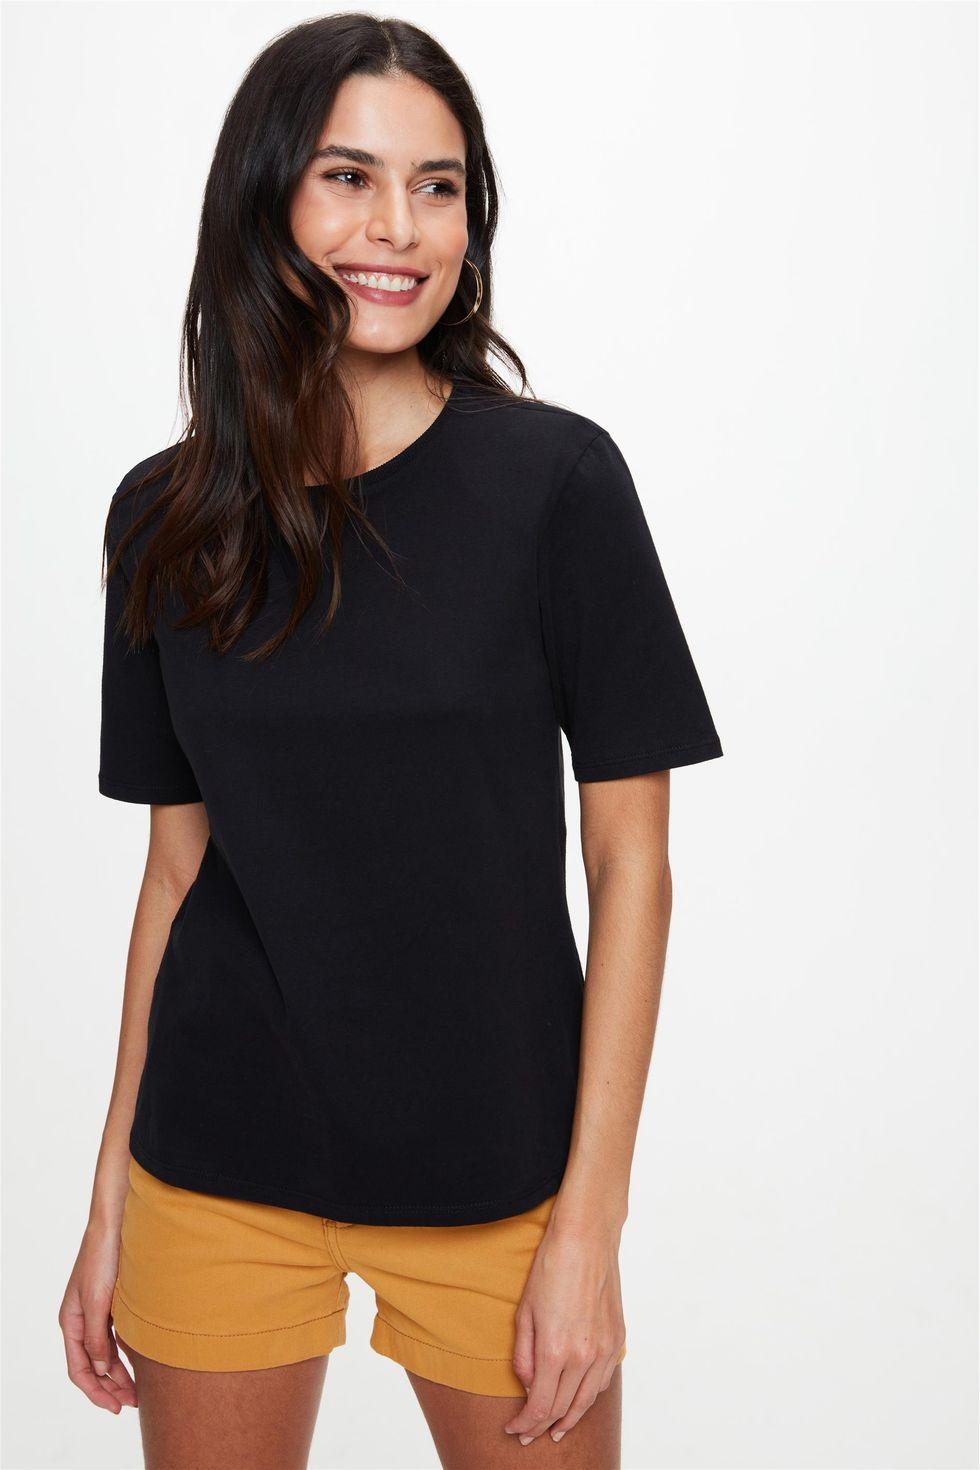 Camiseta-Basica-Lisa-Feminina-Frente--